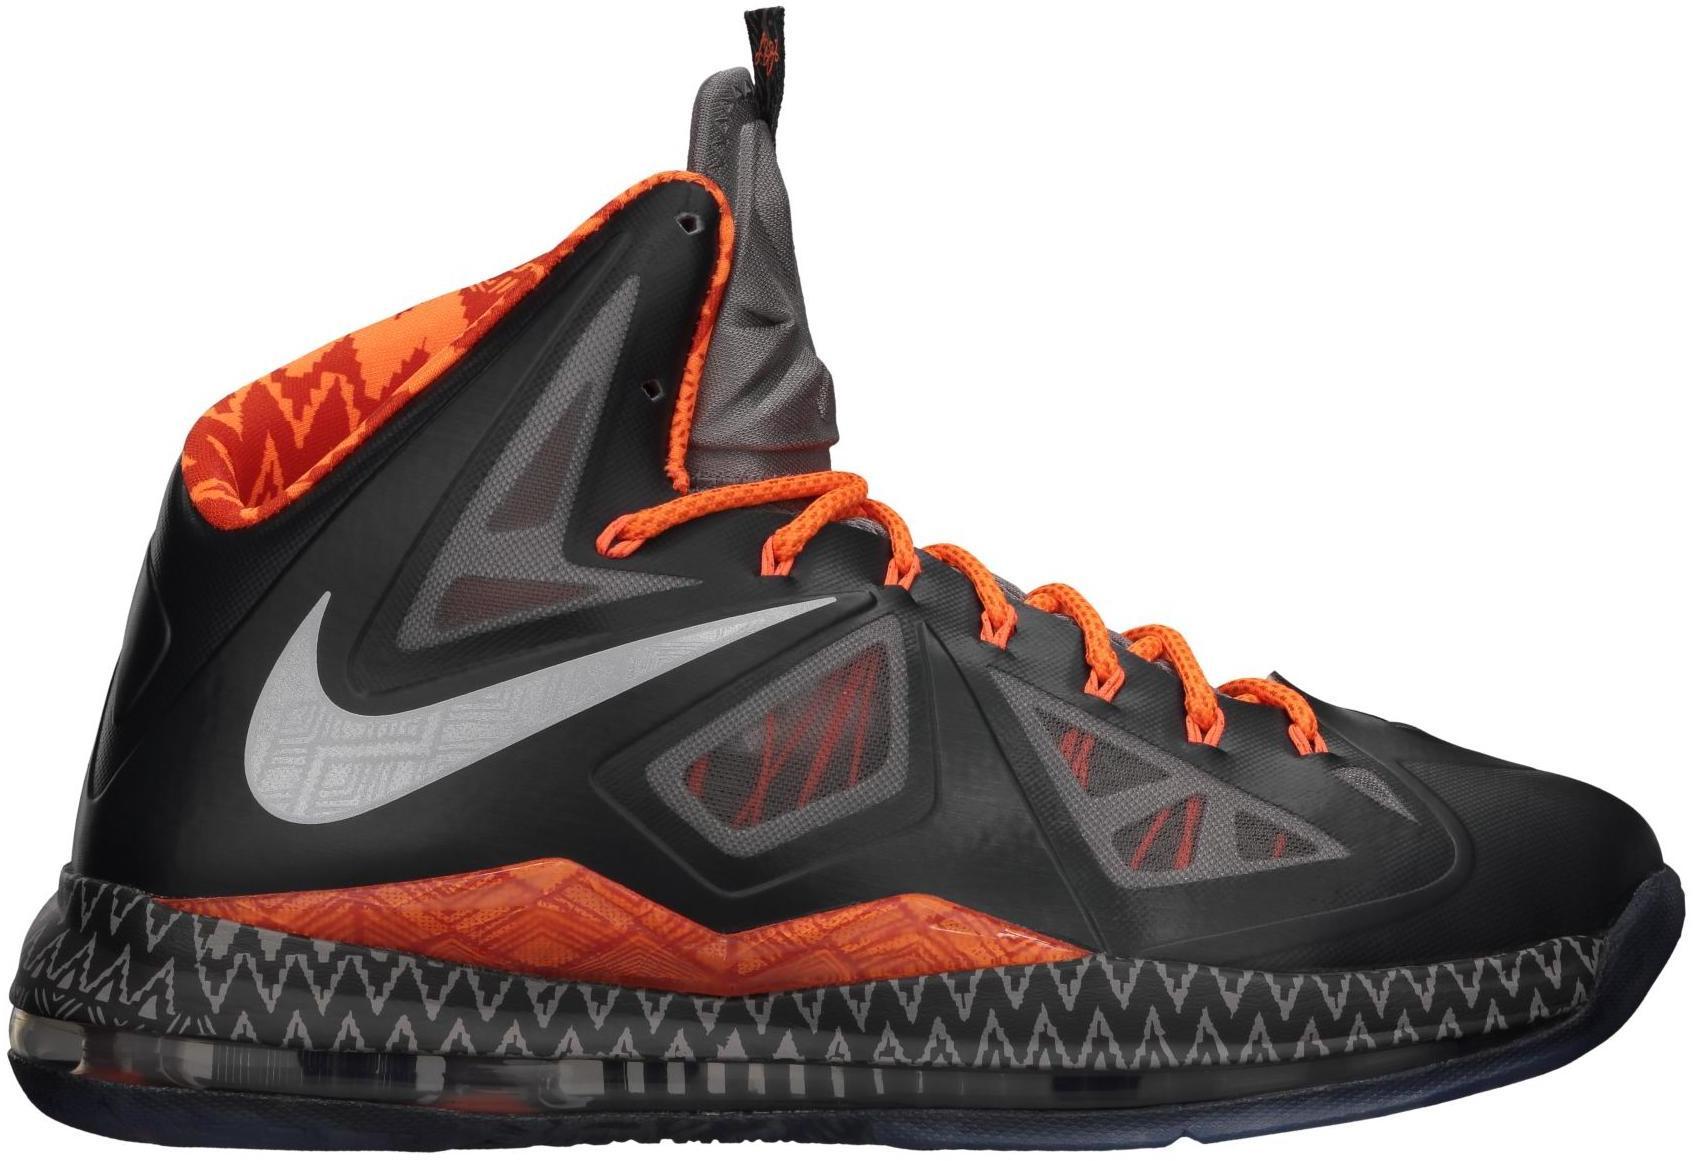 Nike LeBron X Black History Month